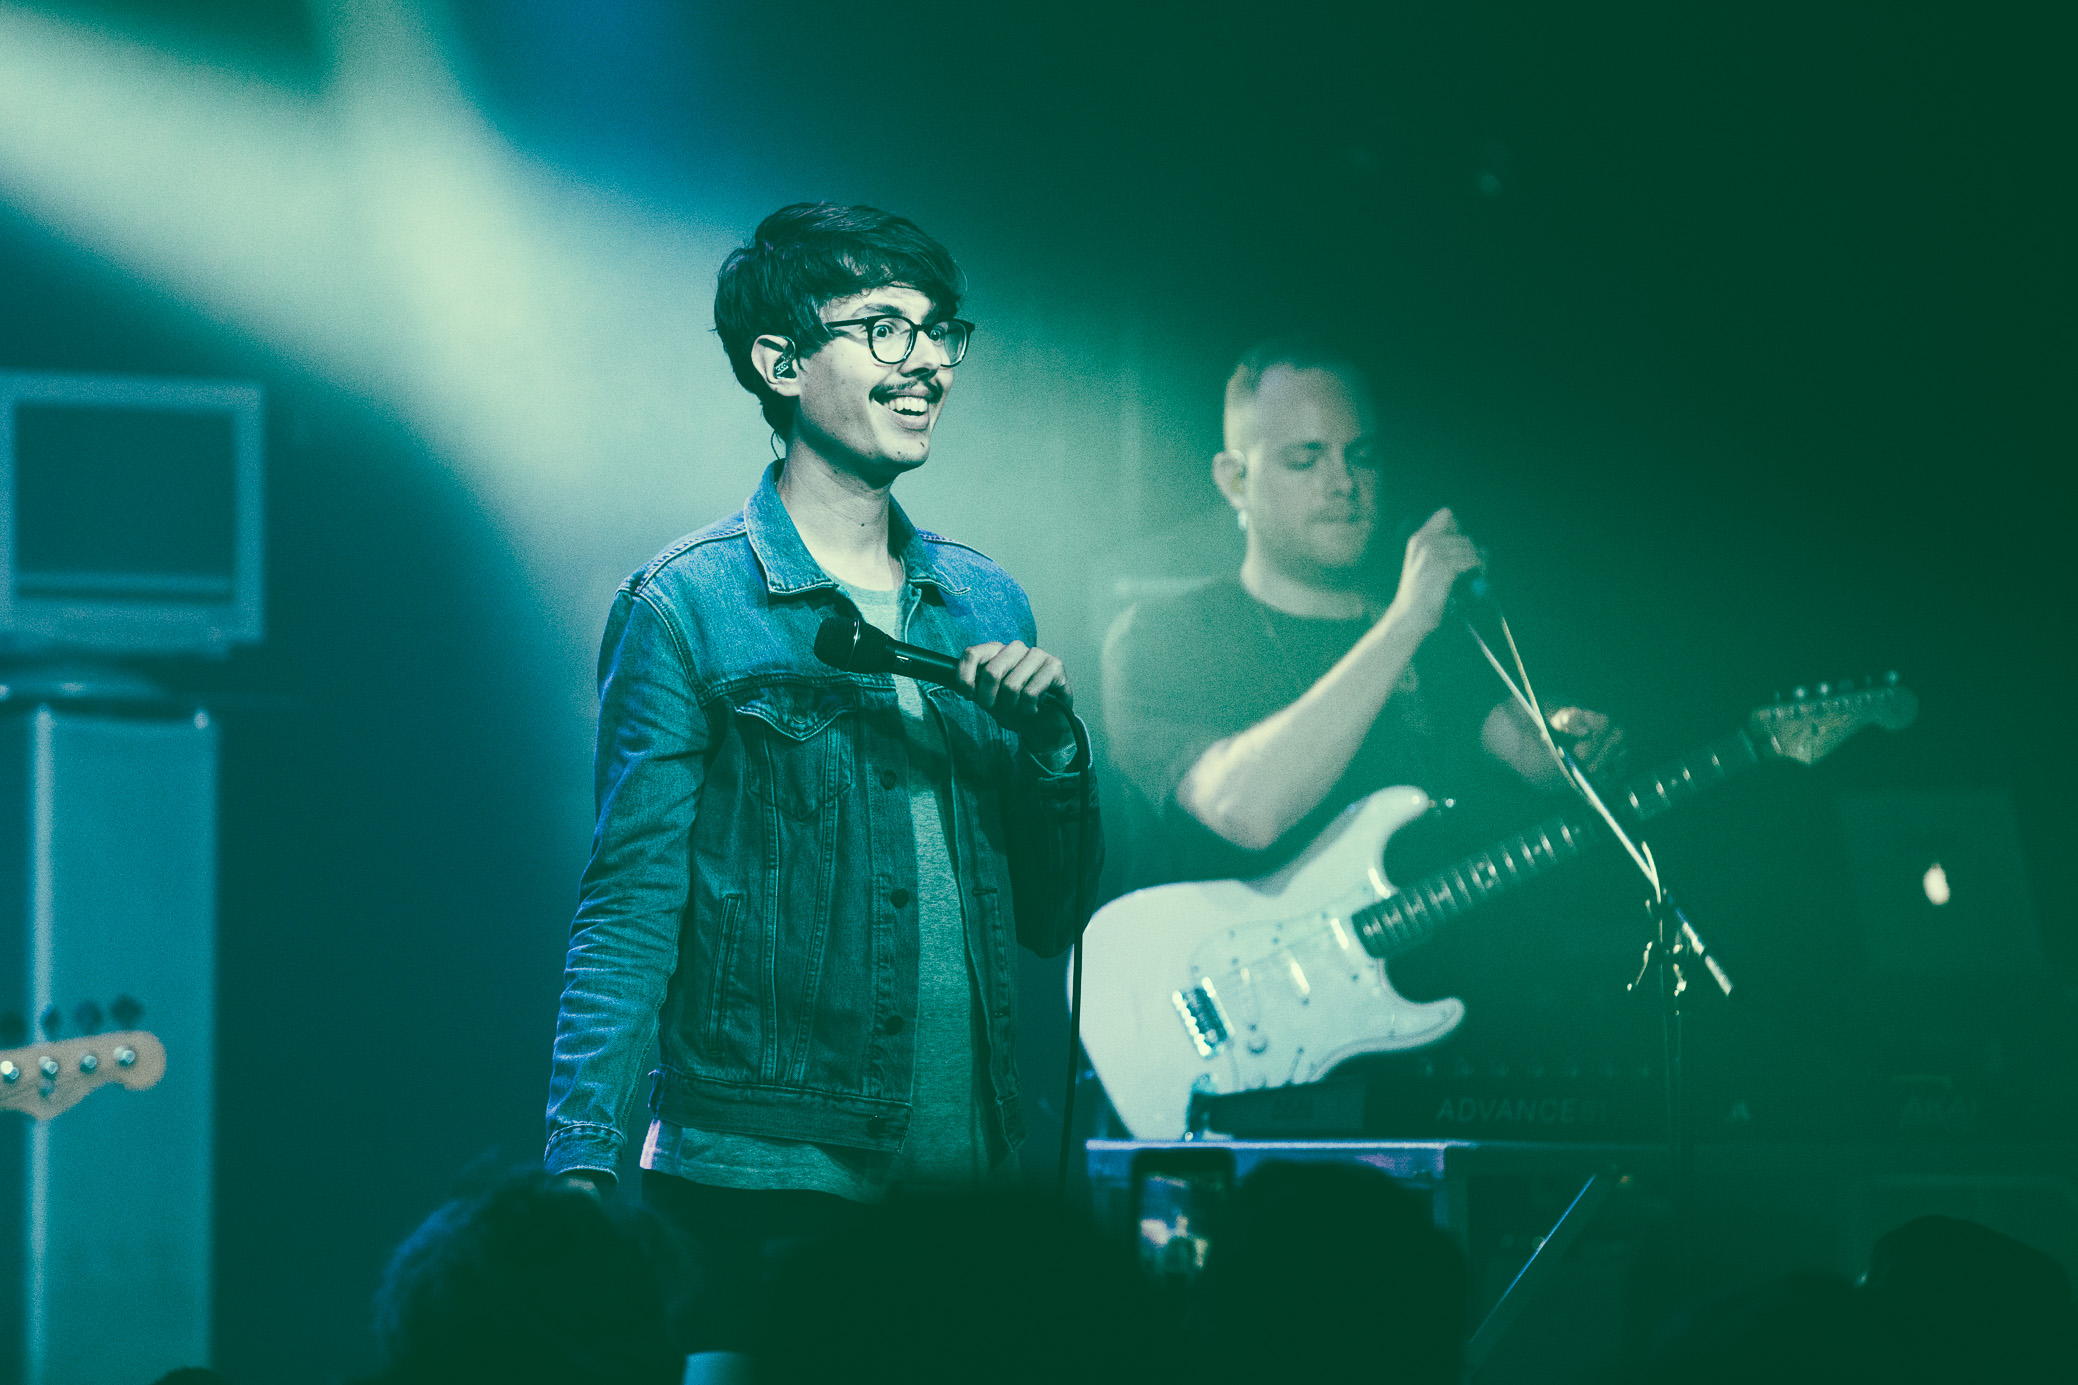 Joywave performs in concert at Saturn Birmingham in Birmingham, Alabama on July 19th, 2018. (Photo by David A. Smith/DSmithScenes)